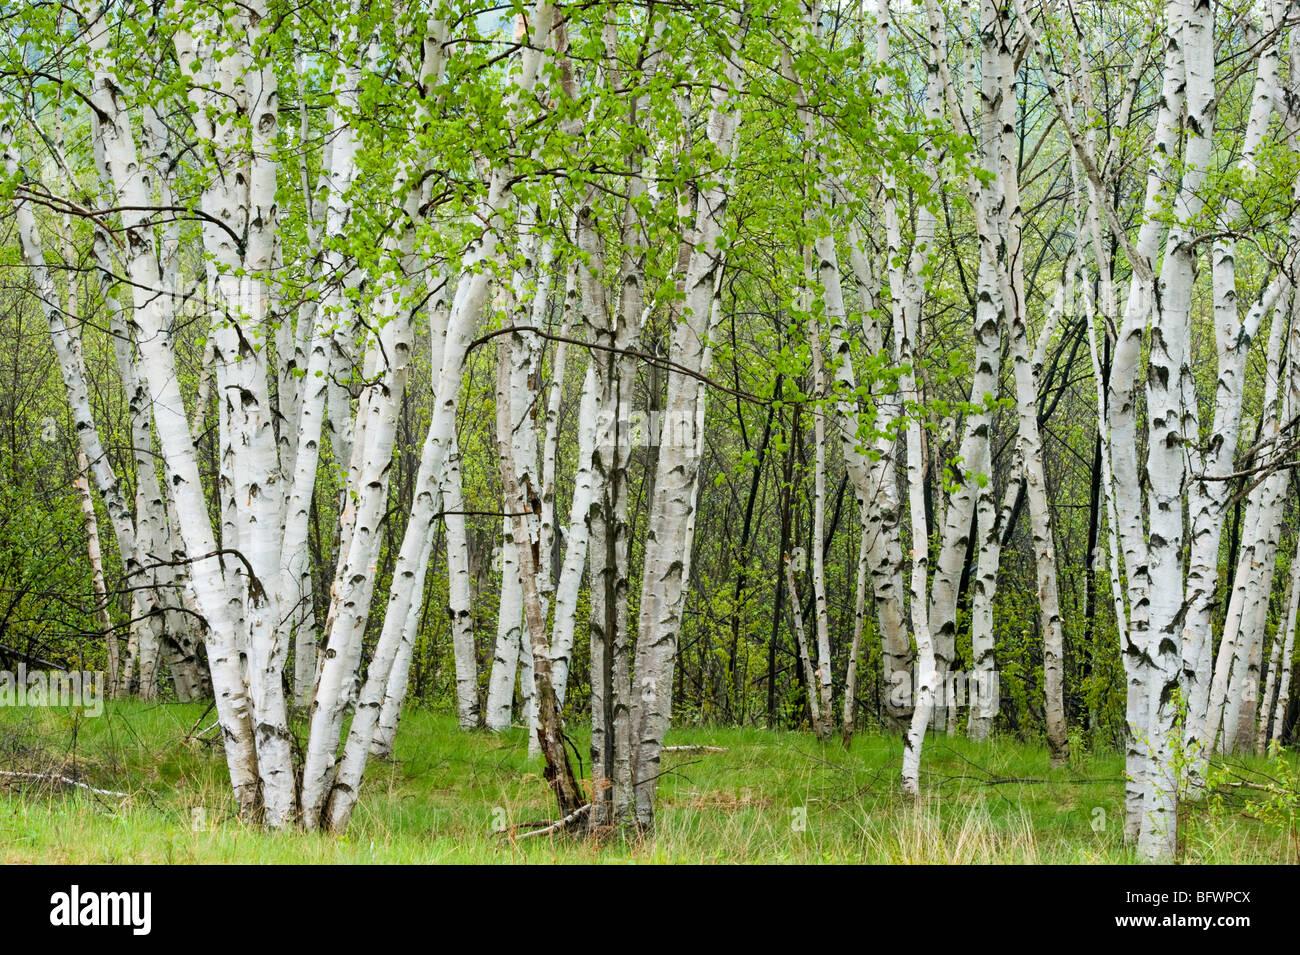 2019 Catalog of Fast Growing Nursery Trees